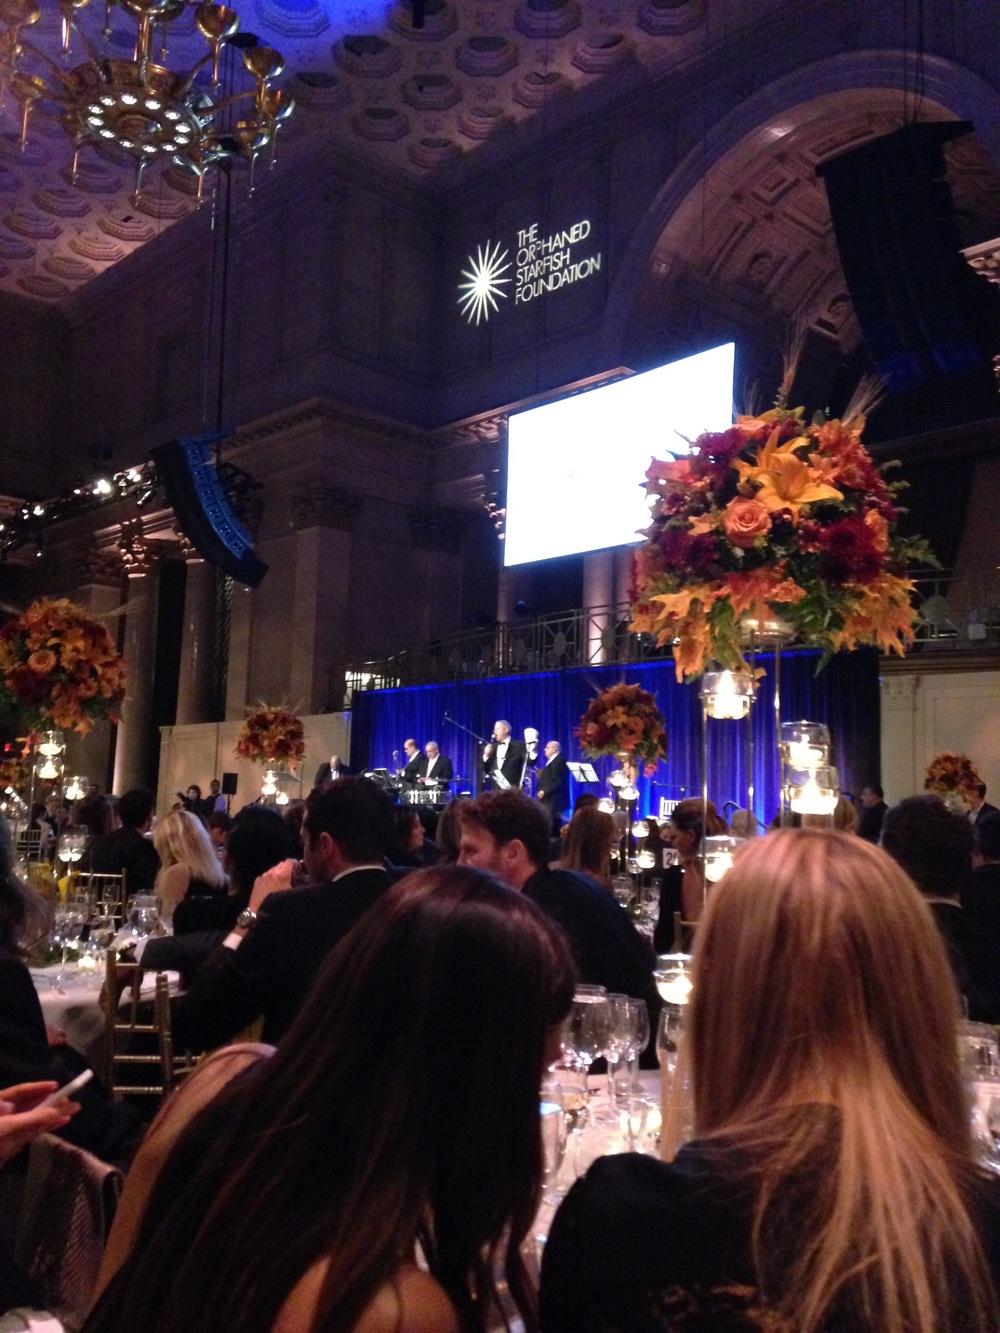 Inside the gala